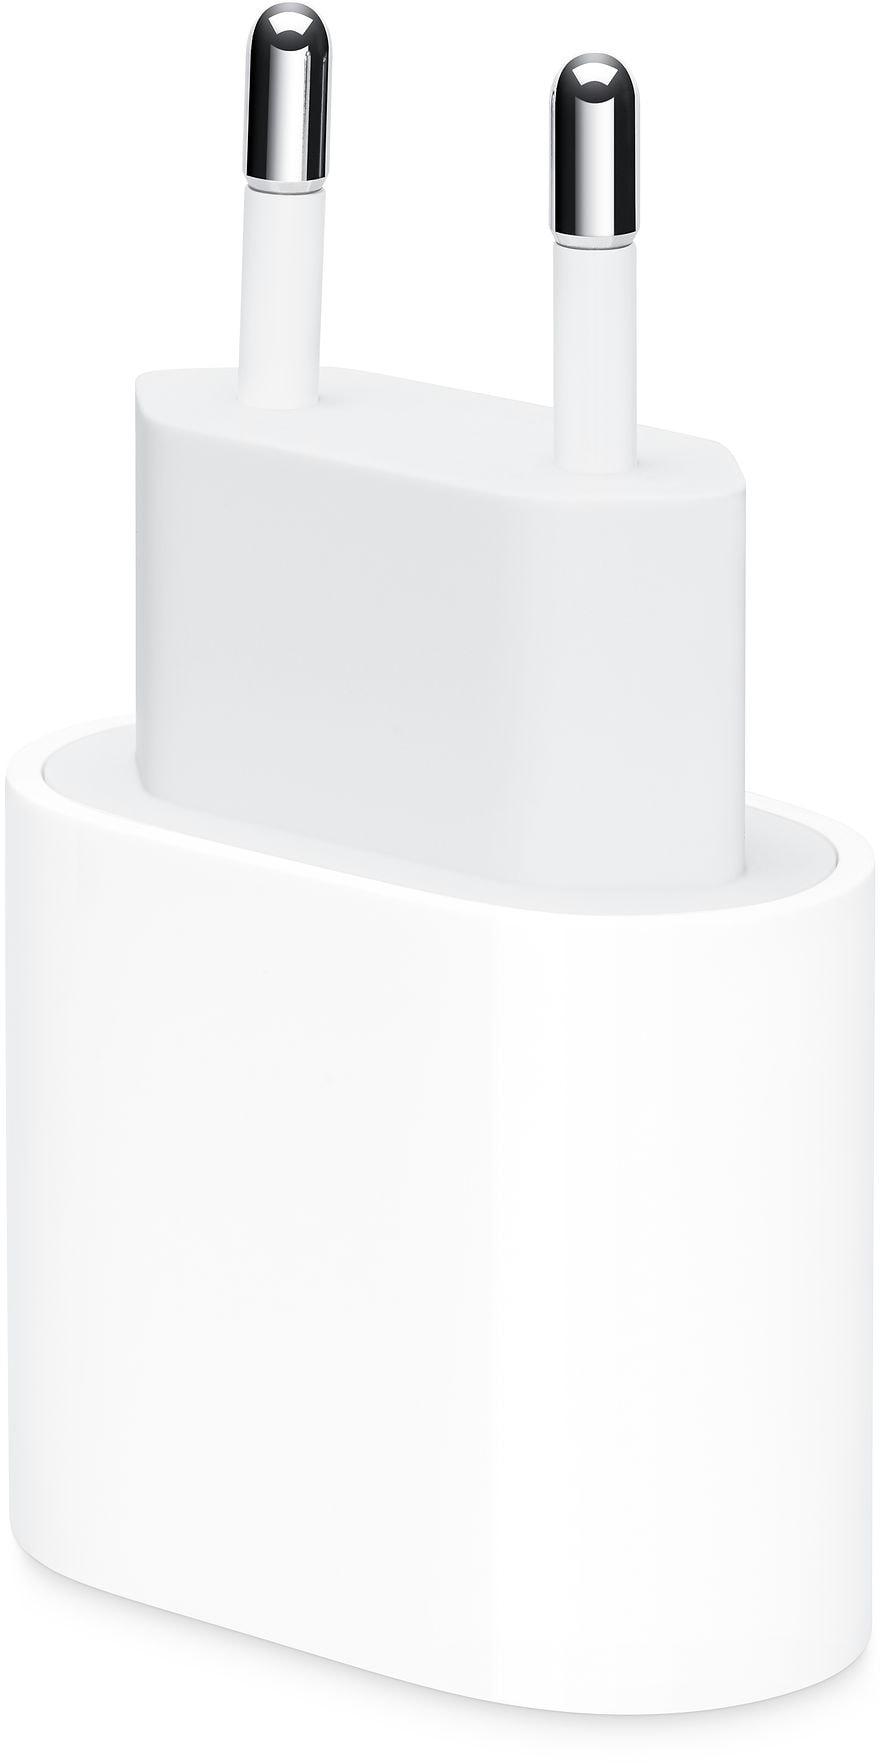 Carregador USB-C de 18W da Apple